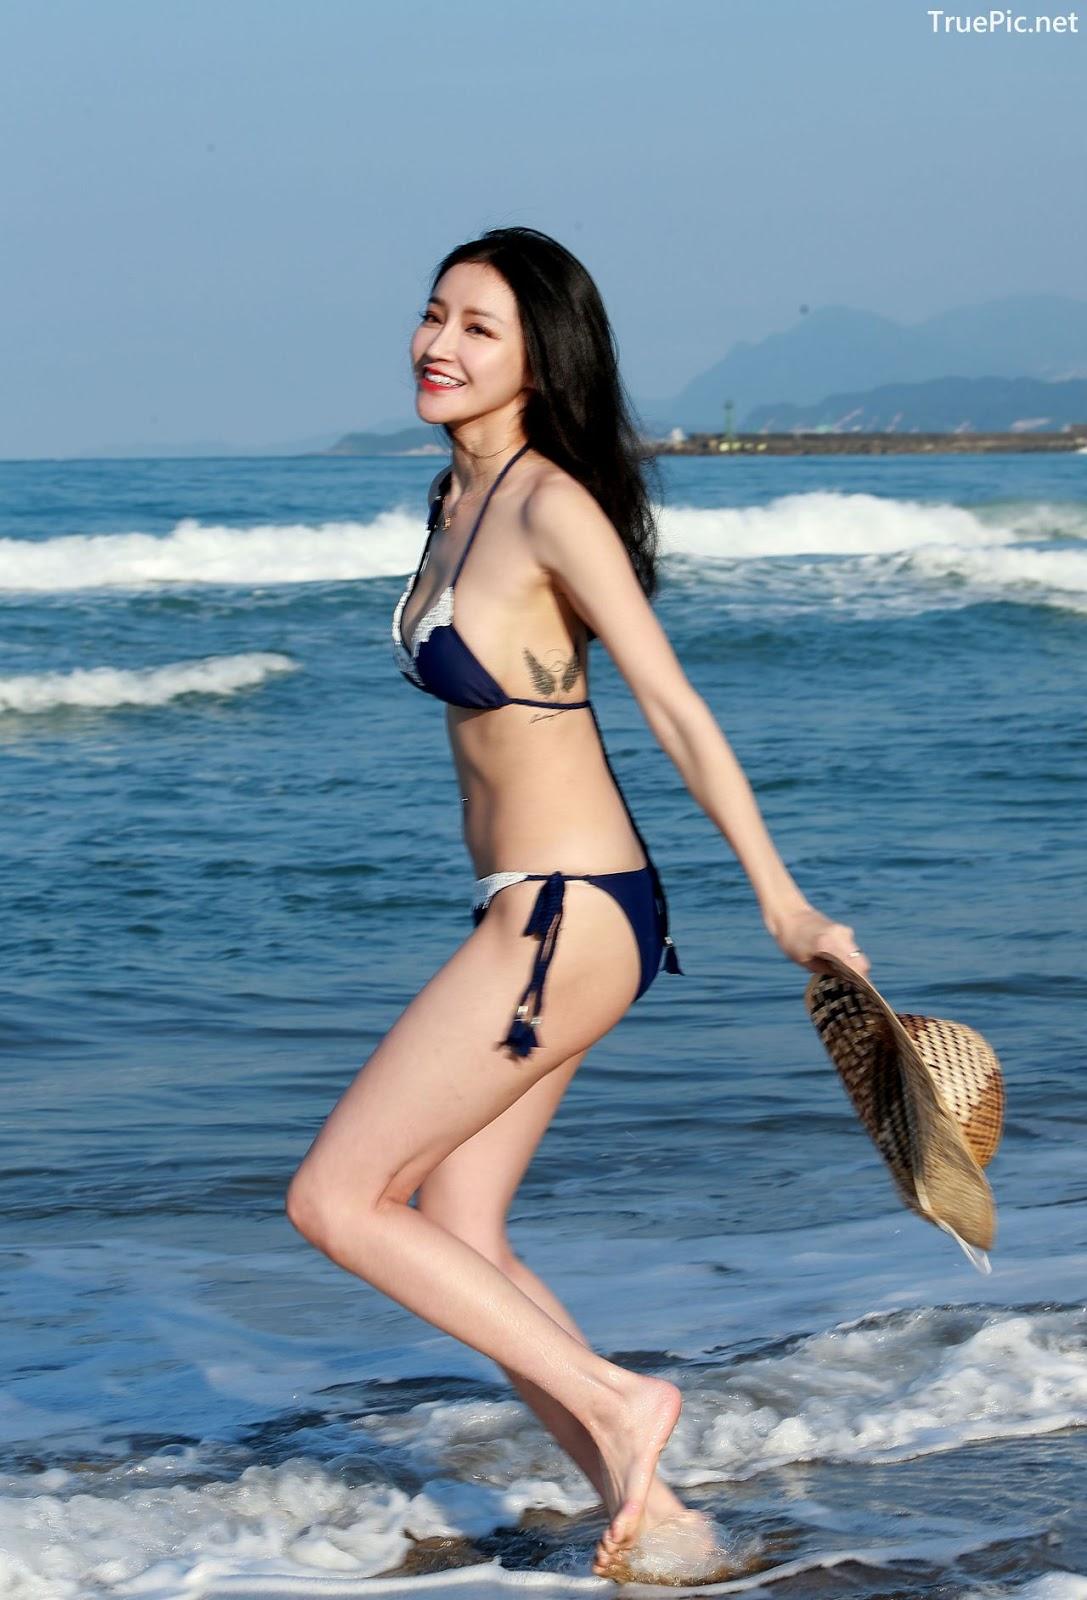 Image-Taiwanese-Model-艾薉-Beautiful-And-Sexy-Bikini-Girl-TruePic.net- Picture-1